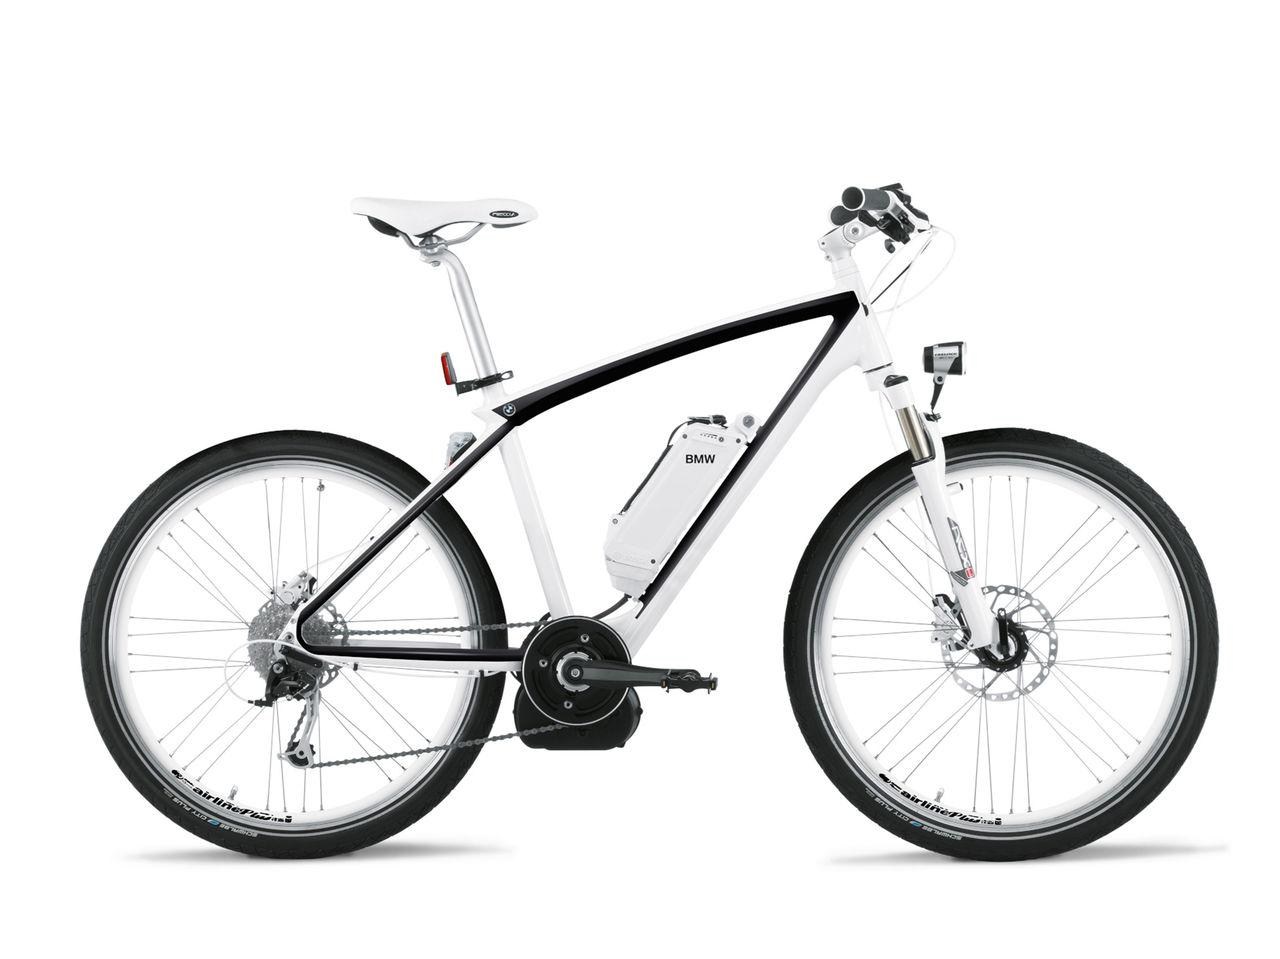 BMW uppdaterar sin elcykel